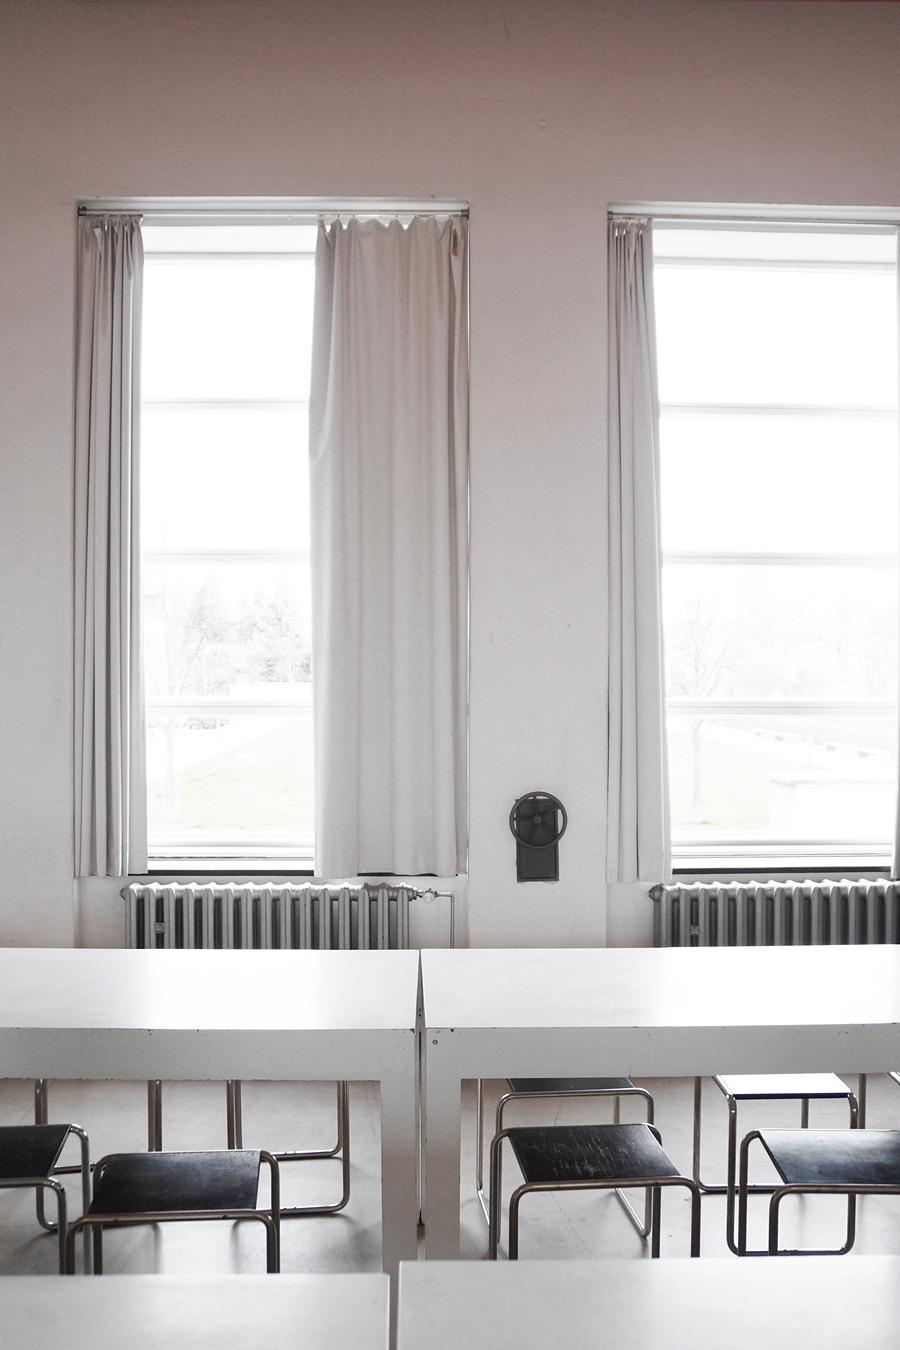 Mensa im Bauhausgebäude. Stiftung Bauhaus Dessau.